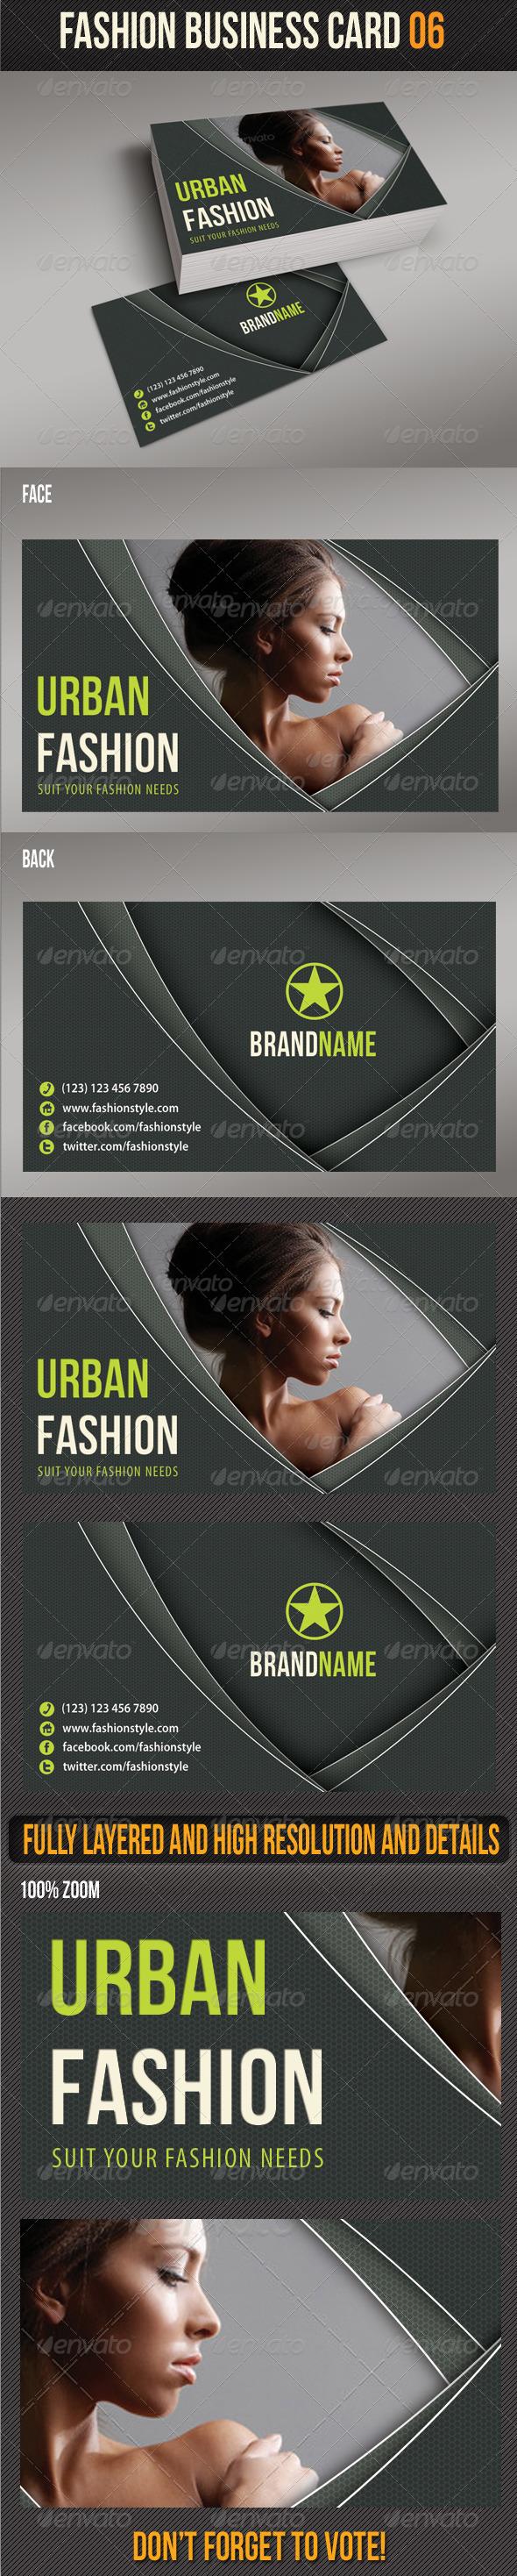 Fashion Business Card 06 - Creative Business Cards